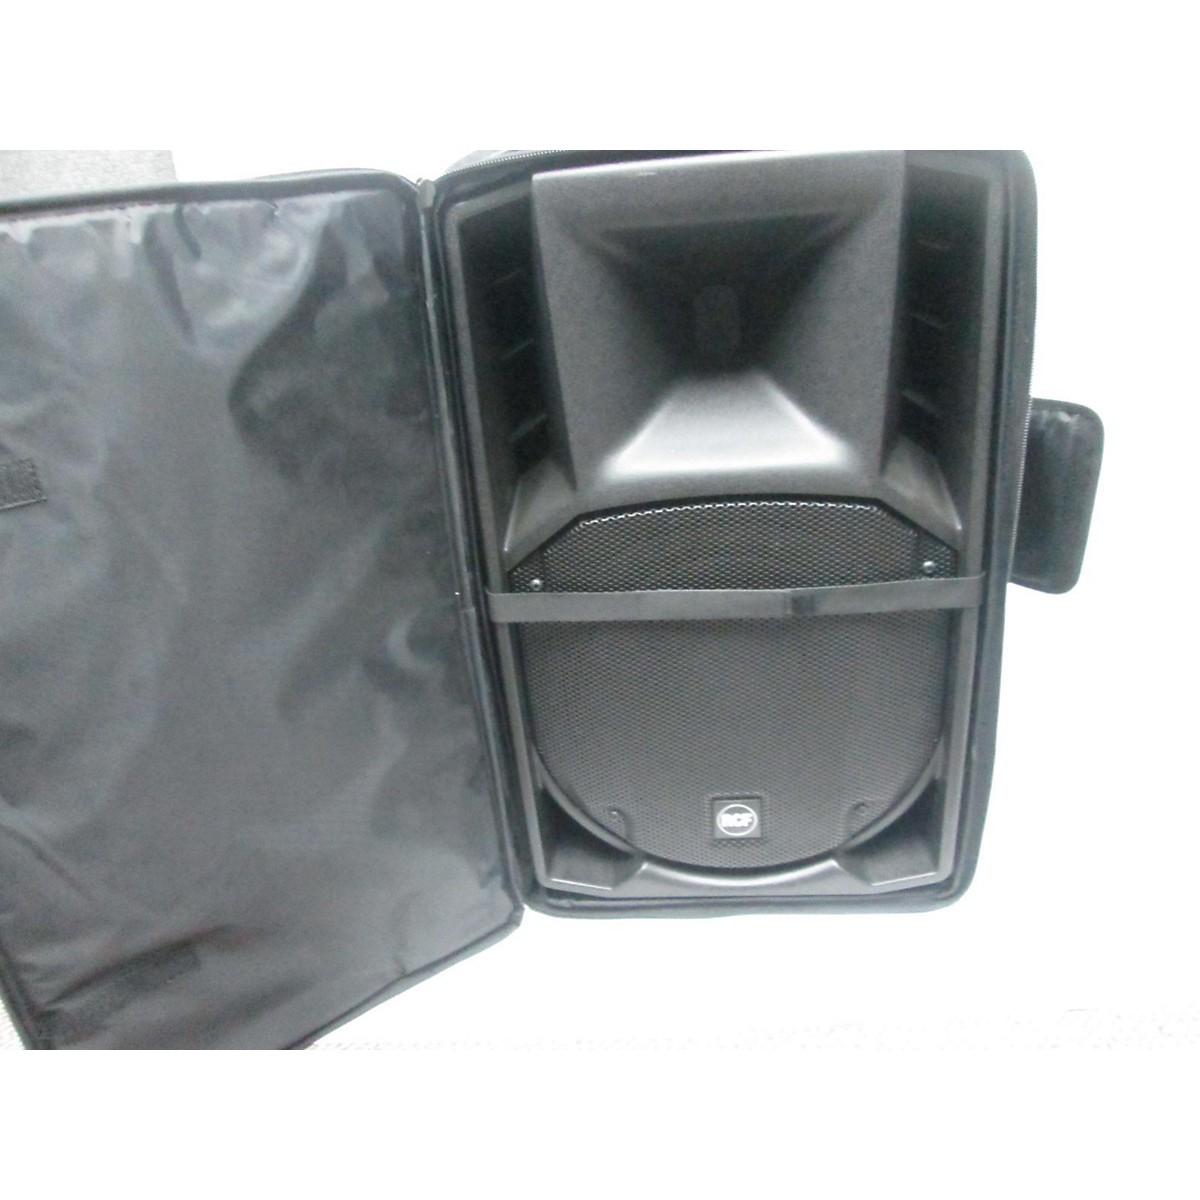 RCF ART 732-A Powered Speaker